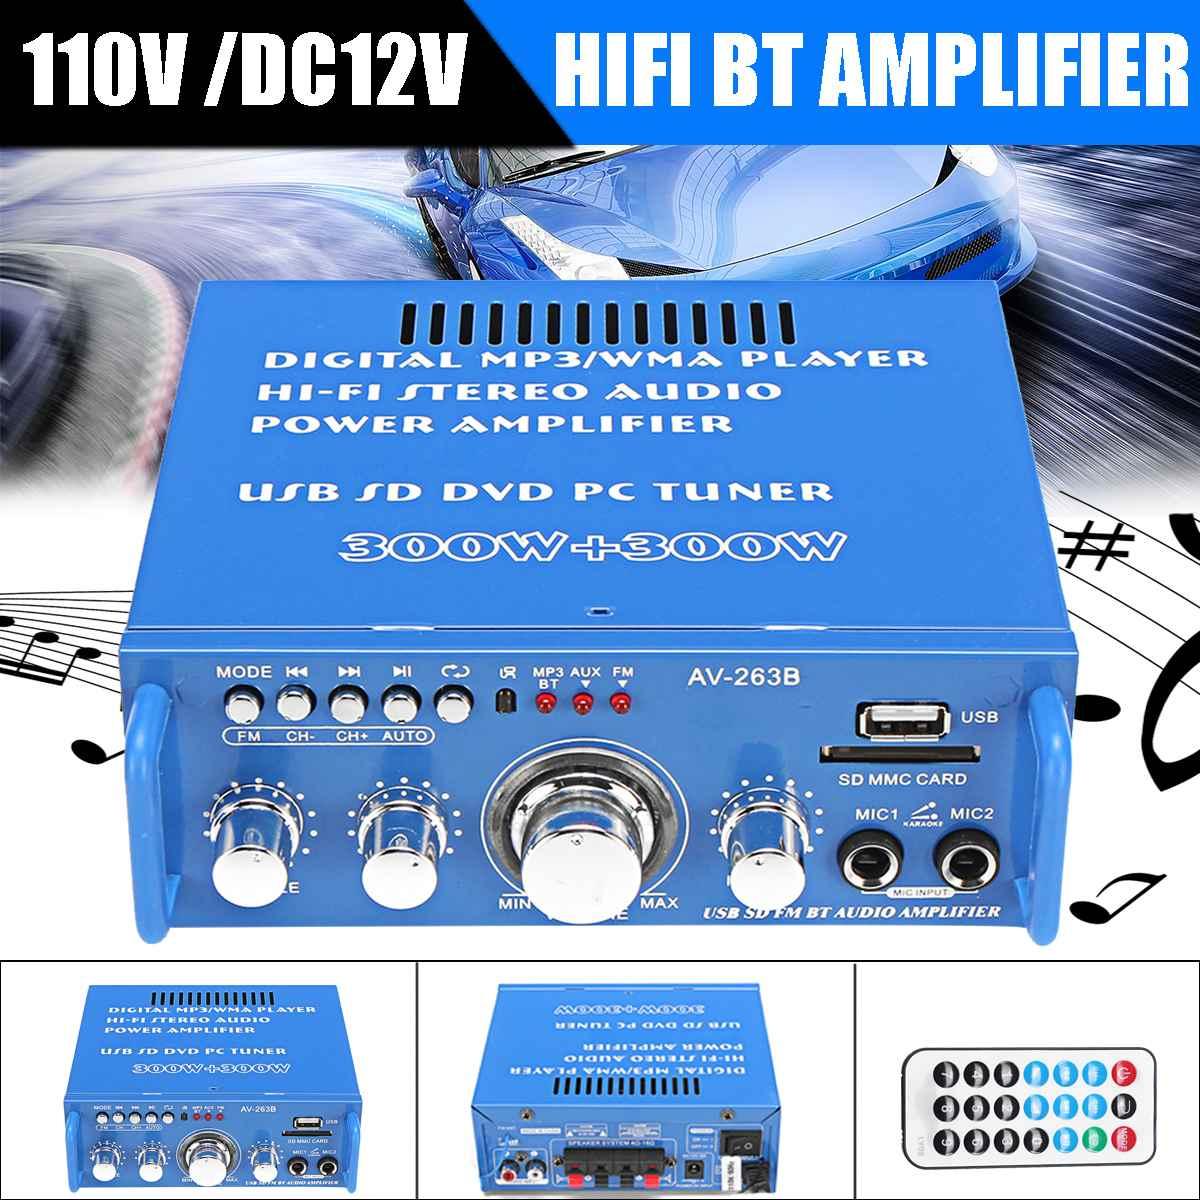 300W + 300W 110V/12V casa Amplificador de potencia de Audio estéreo HIFI 2 CH Digital bluetooth Mini Amplificador FM MP3 reproductor de música